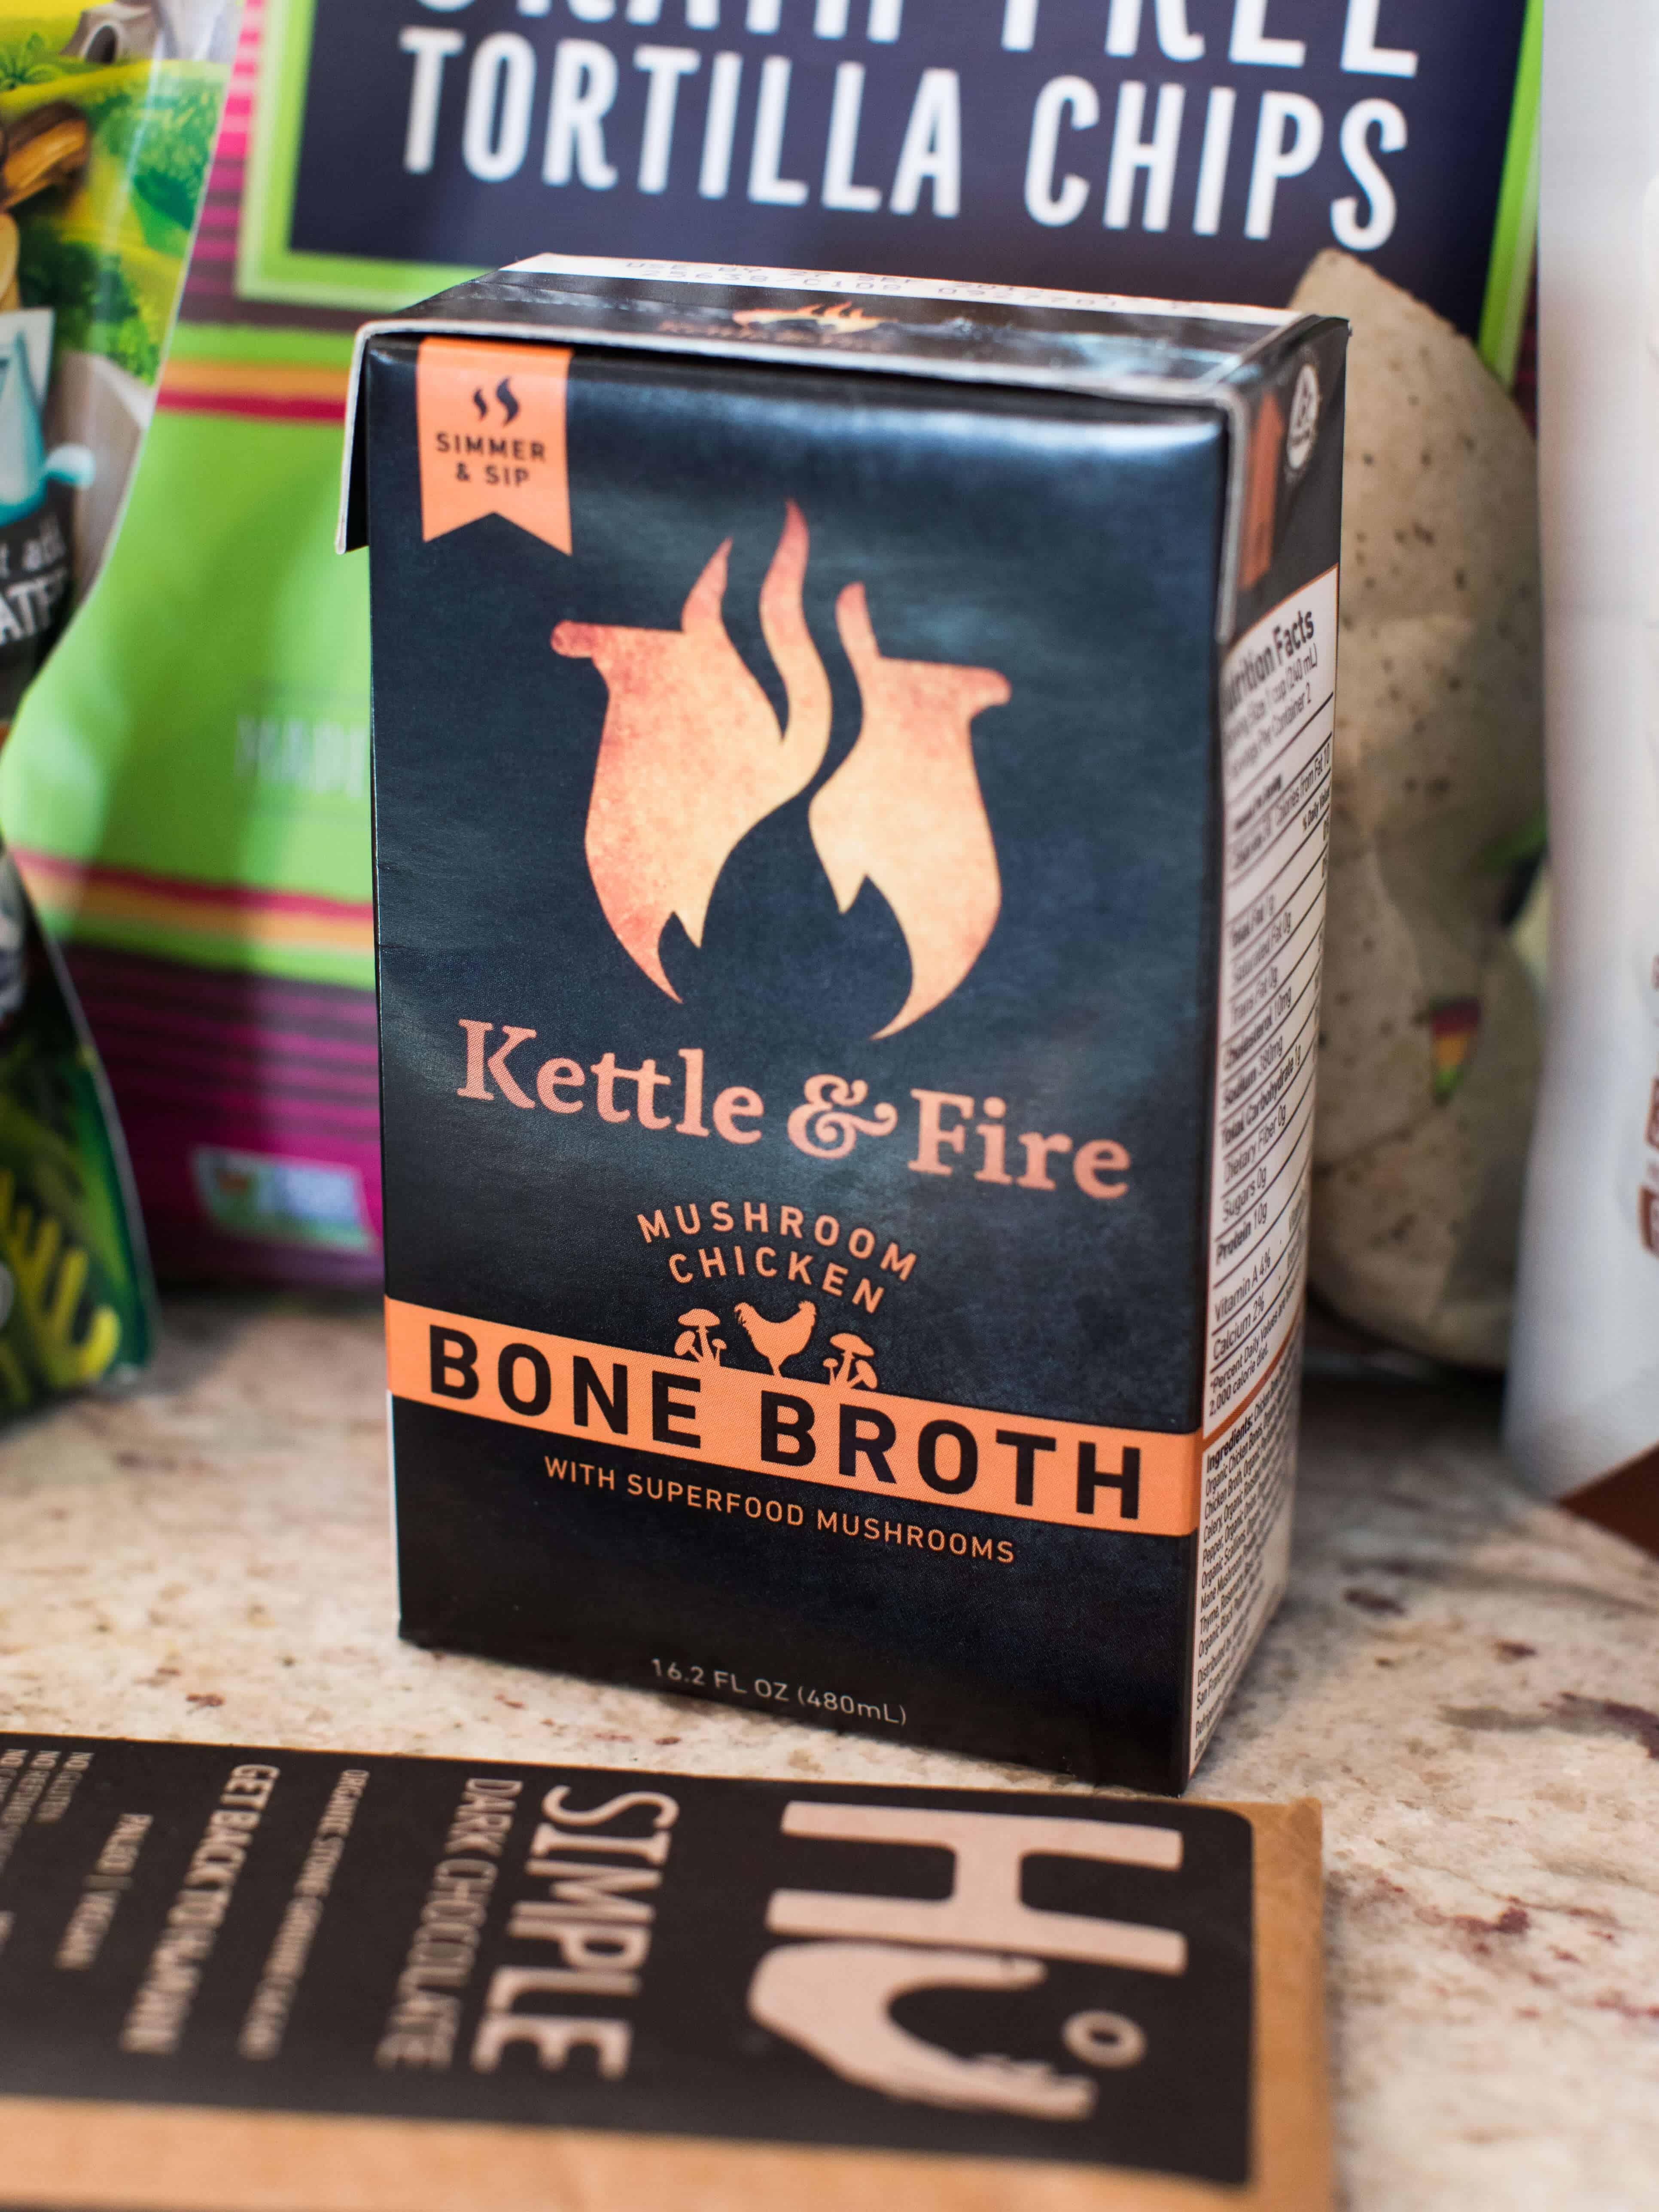 New In My Pantry #saveeandsavory #birchbenders #healthypantry #peekinmypantry #healthhabits #kettleandfire